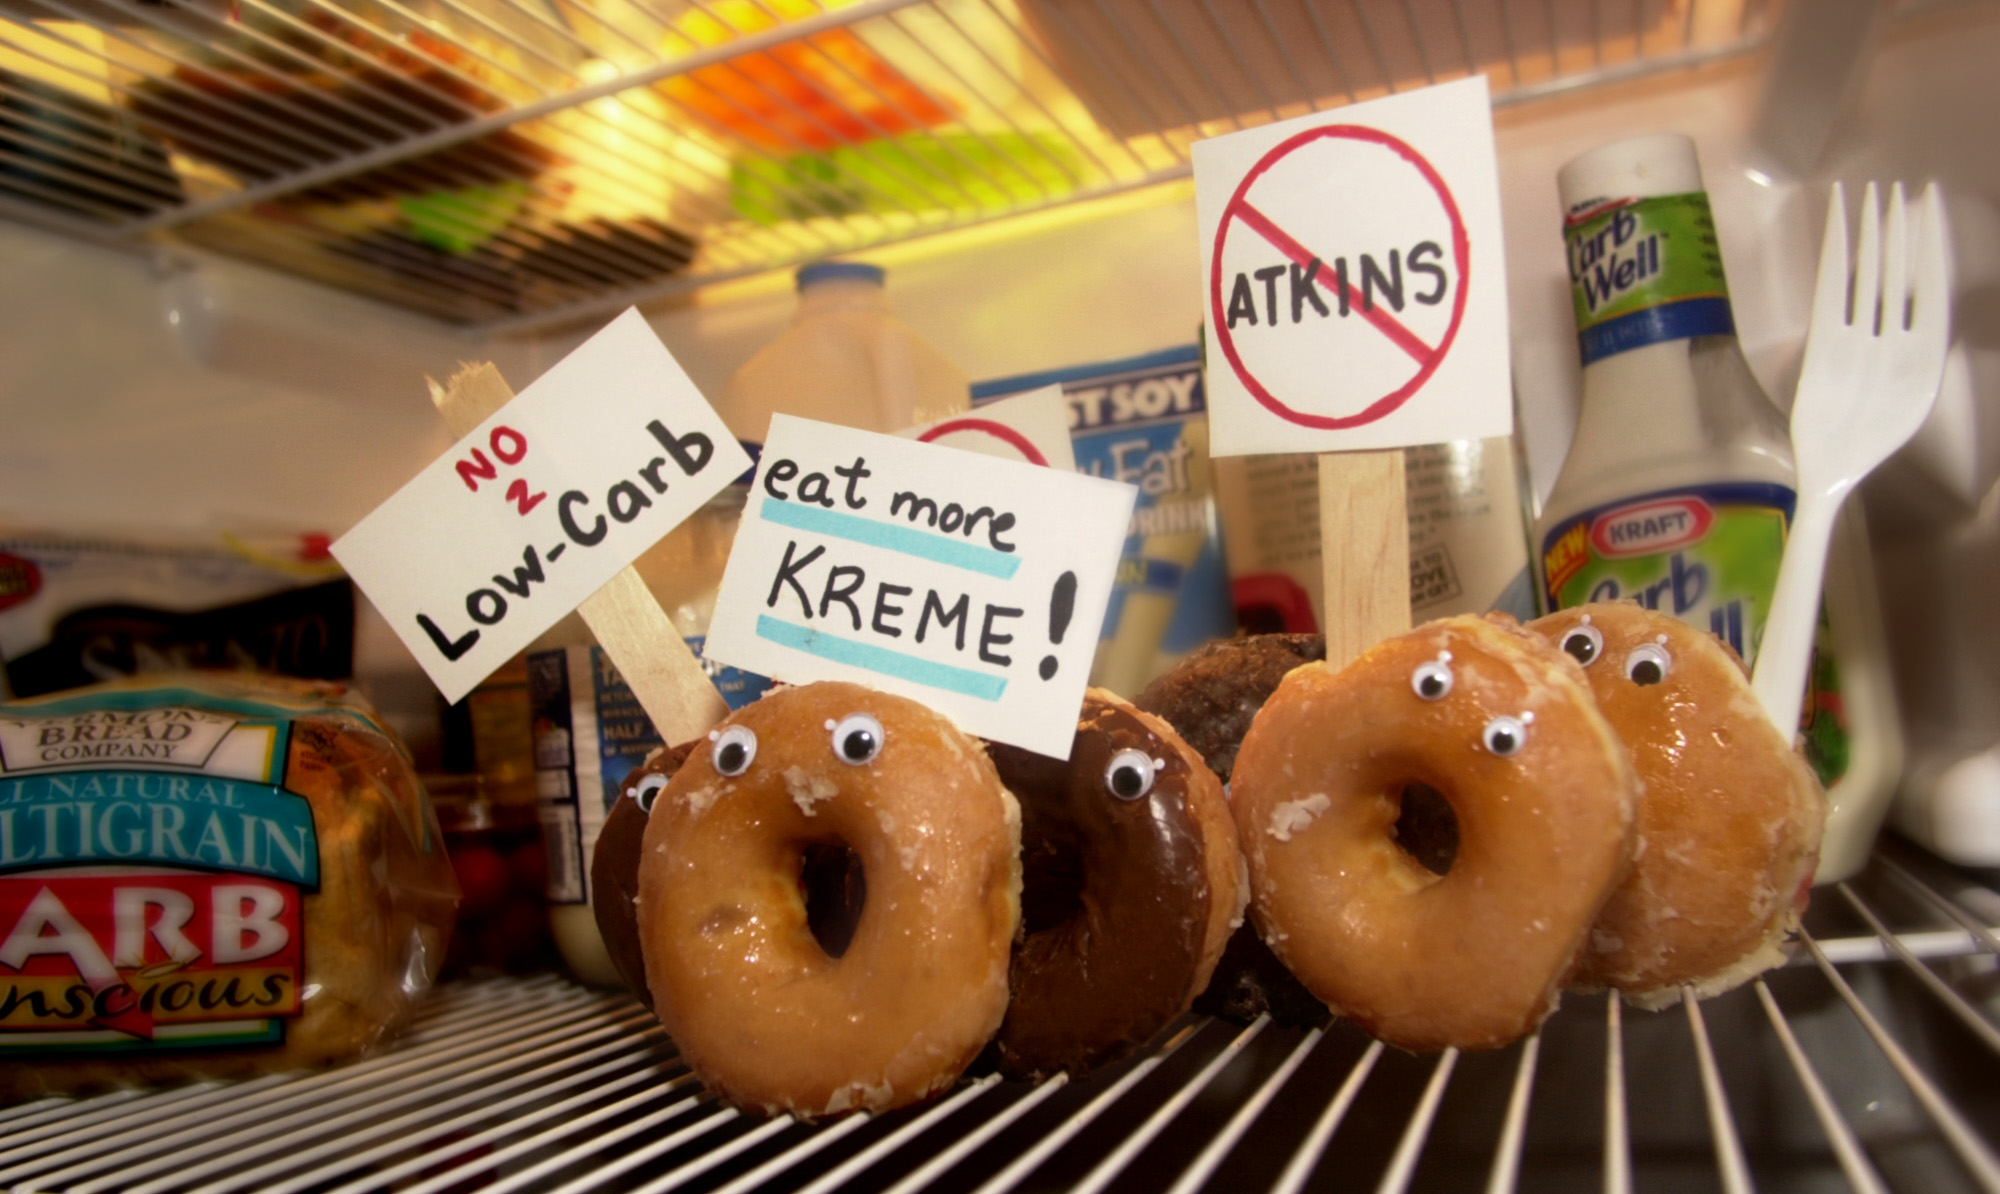 The Krispy Kreme protest